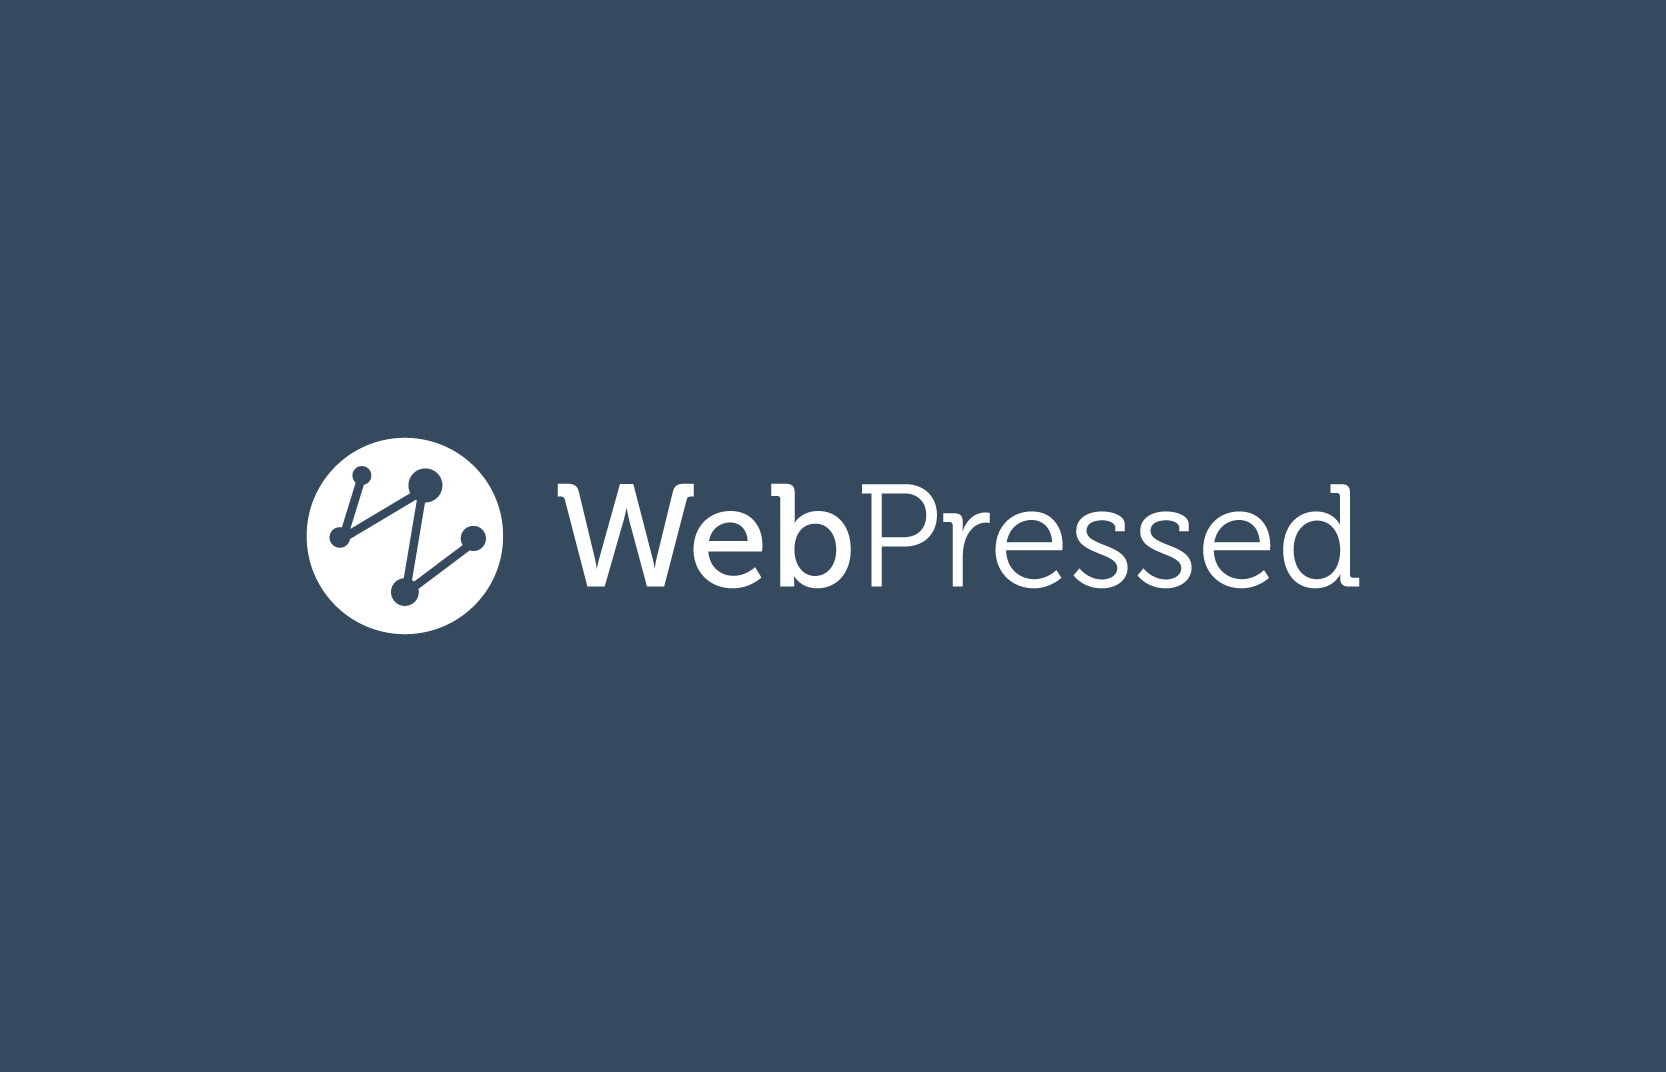 logo_webpressed_logo1